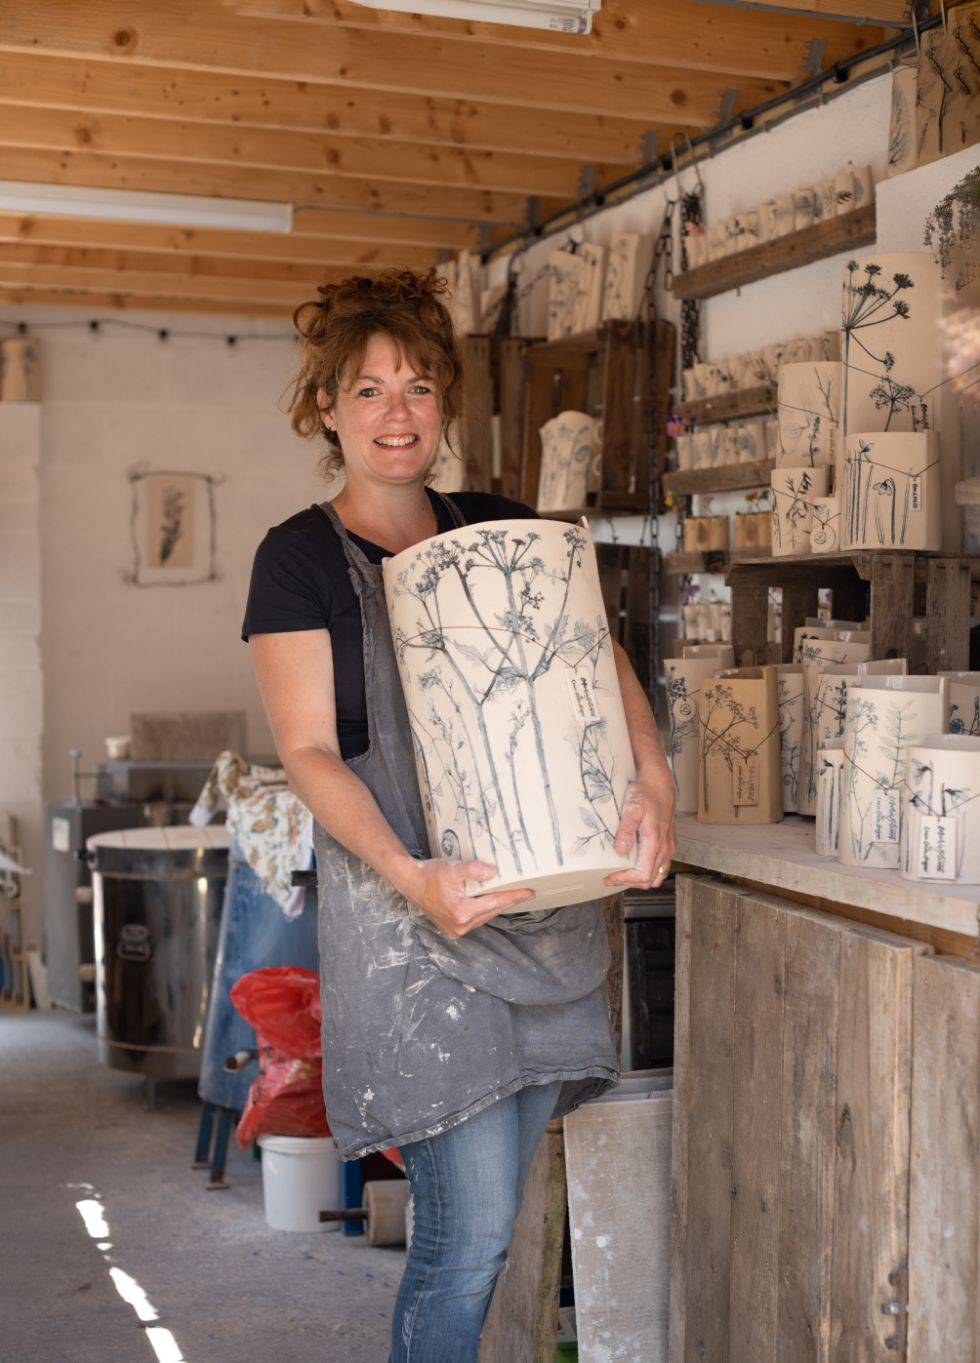 Louise Condon, Ceramic Botanist, in her pottery studio